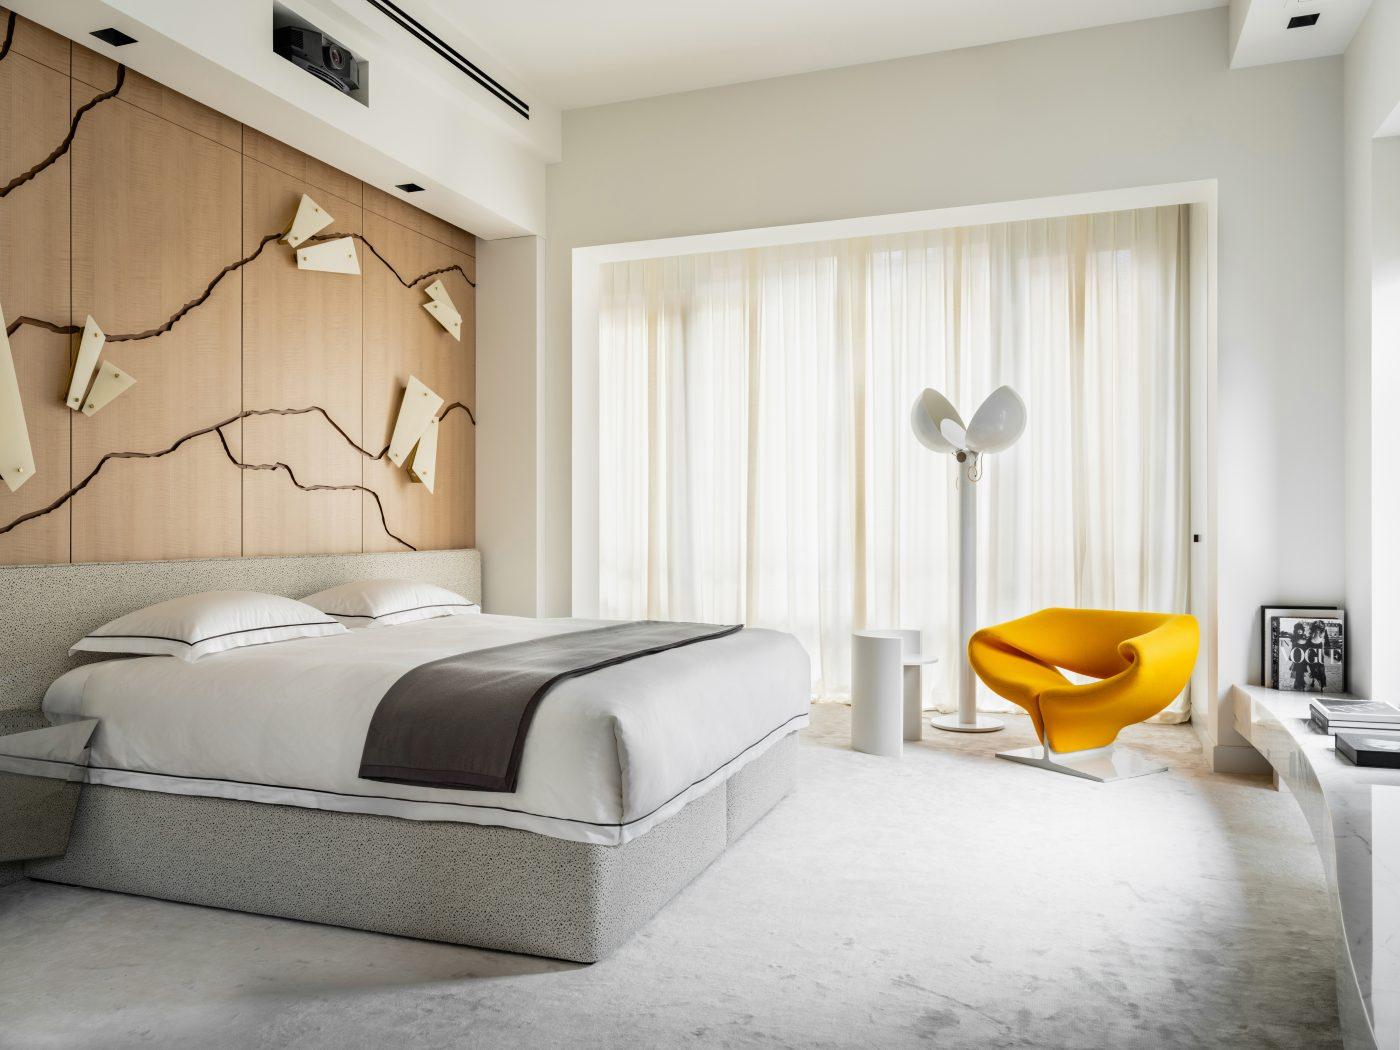 Bedroom designed by Malyeva